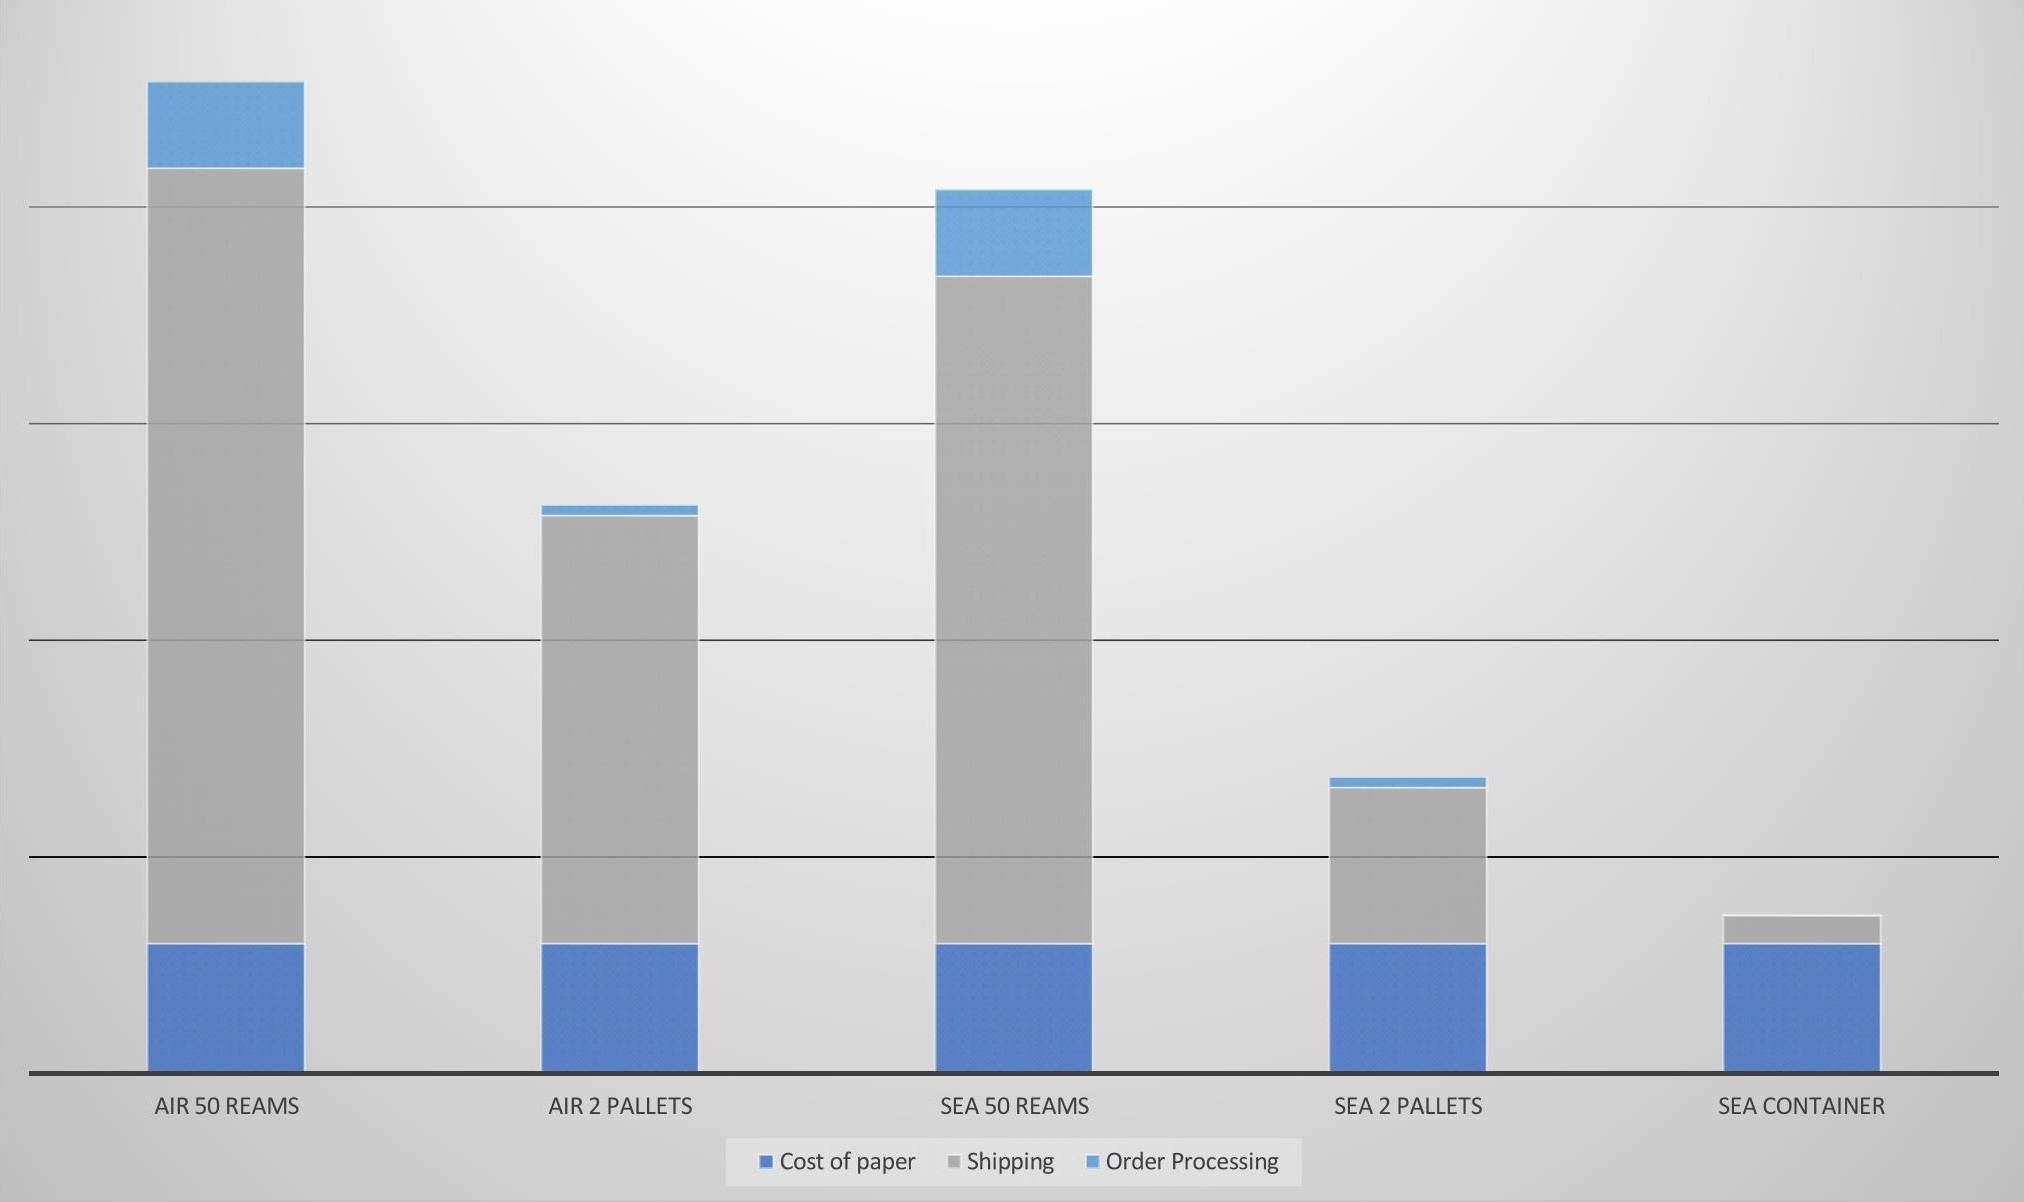 Freight Comparison_Page_1 (2).jpeg